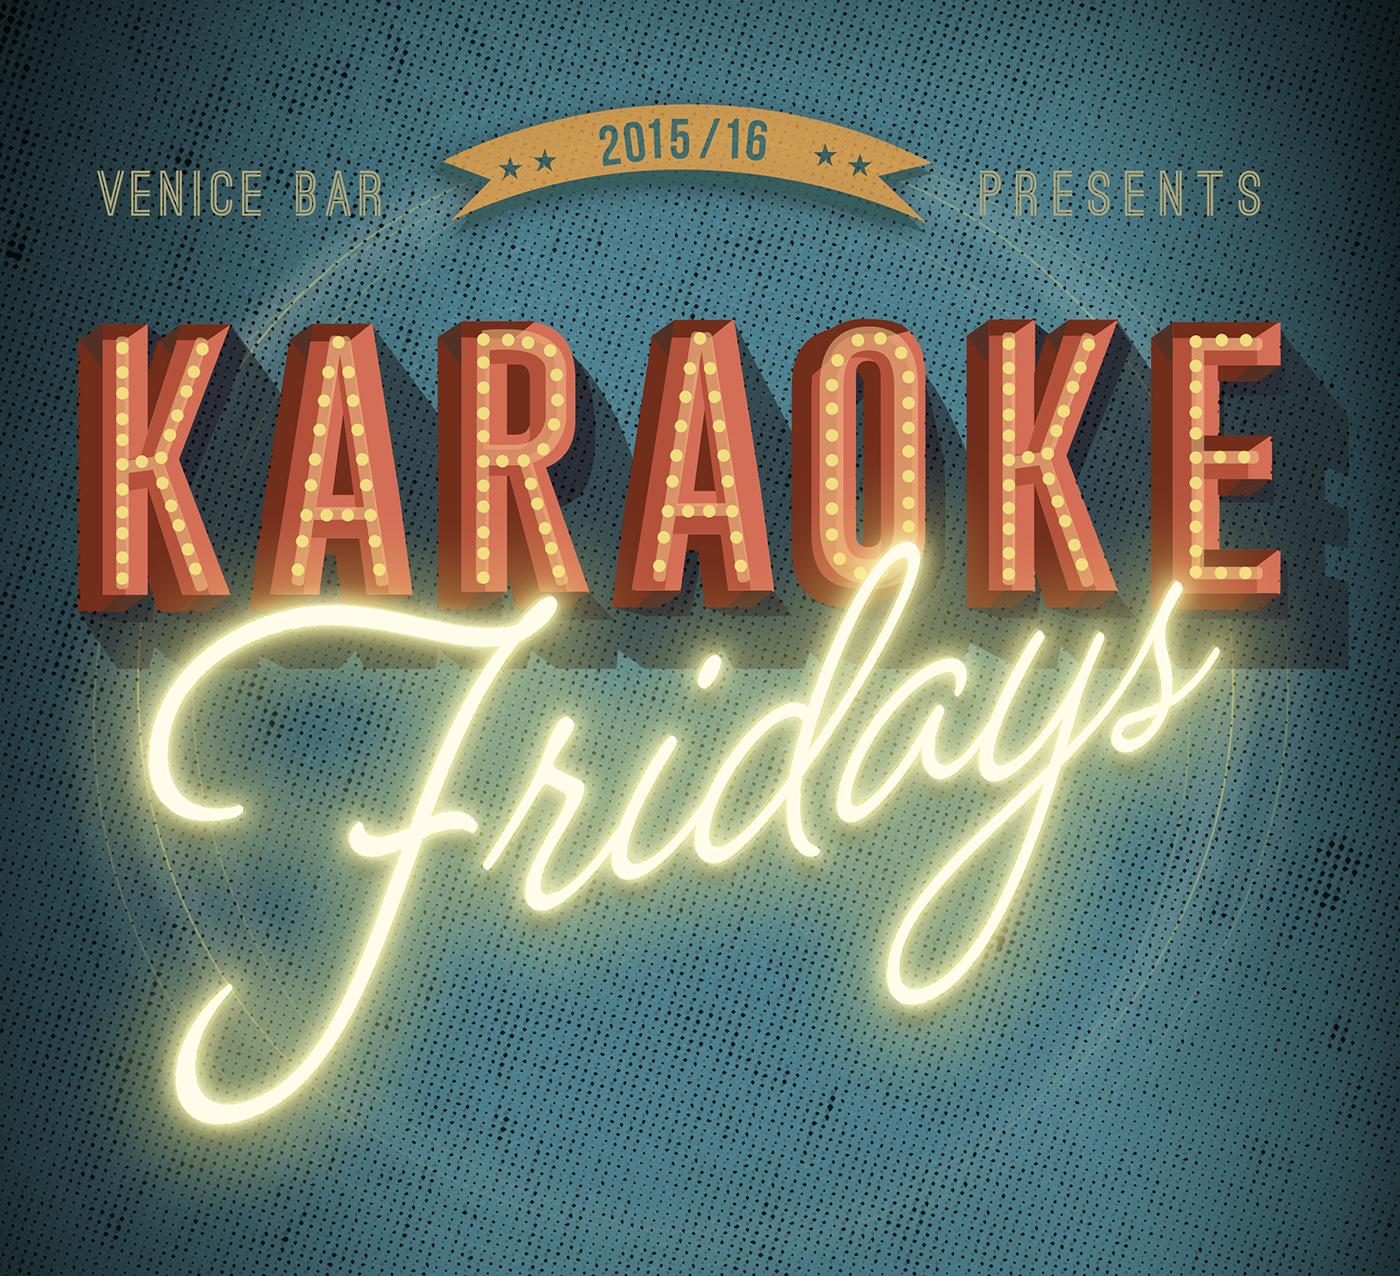 Karaoke Friday Poster